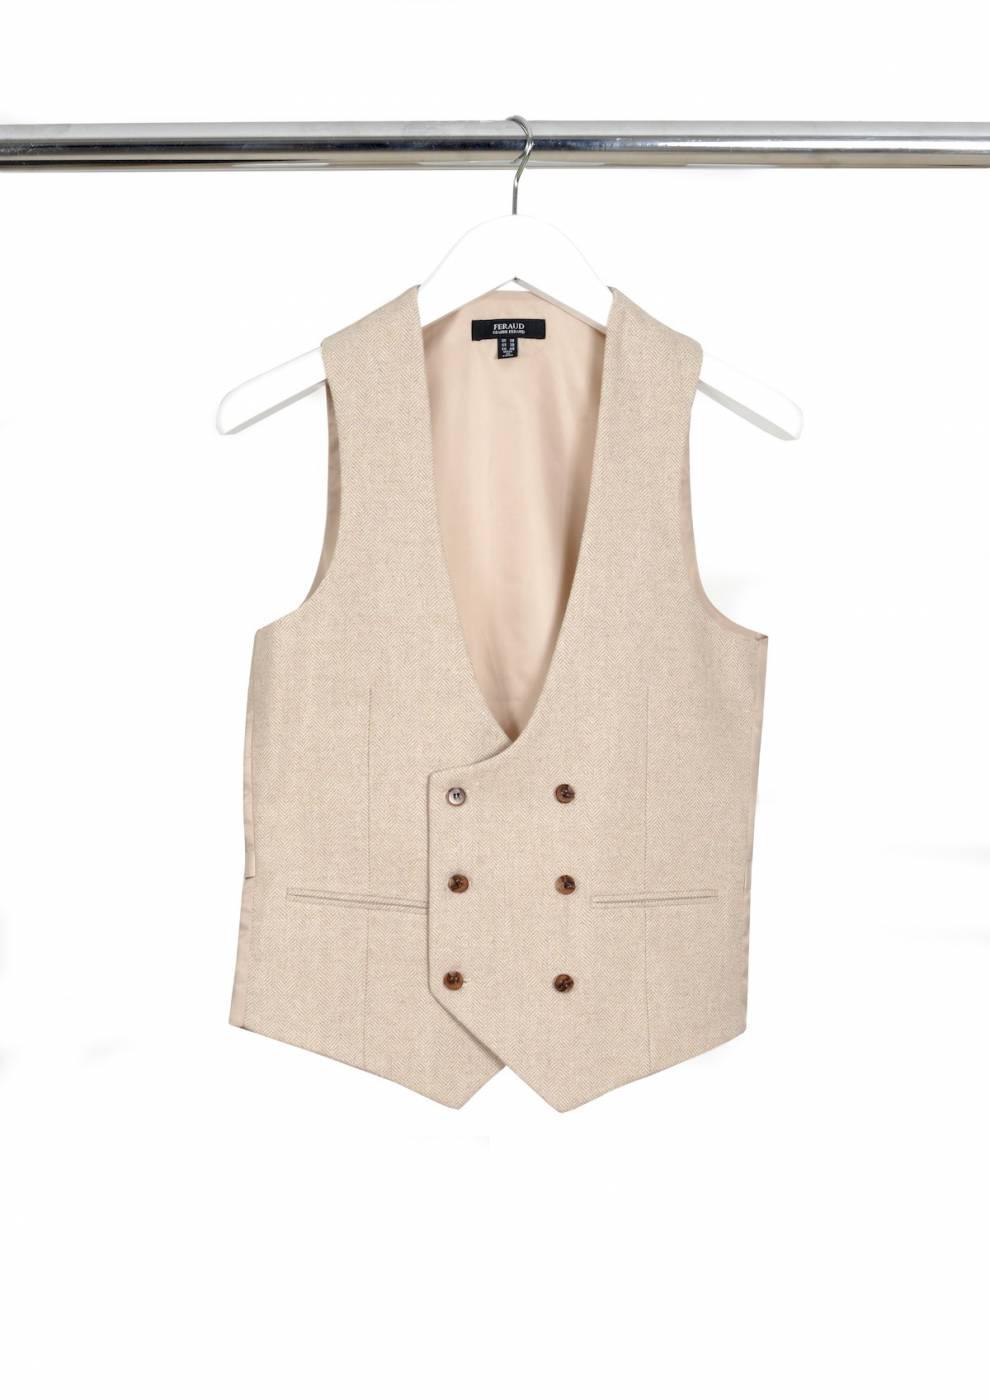 3.PacinoWaistcoat-small